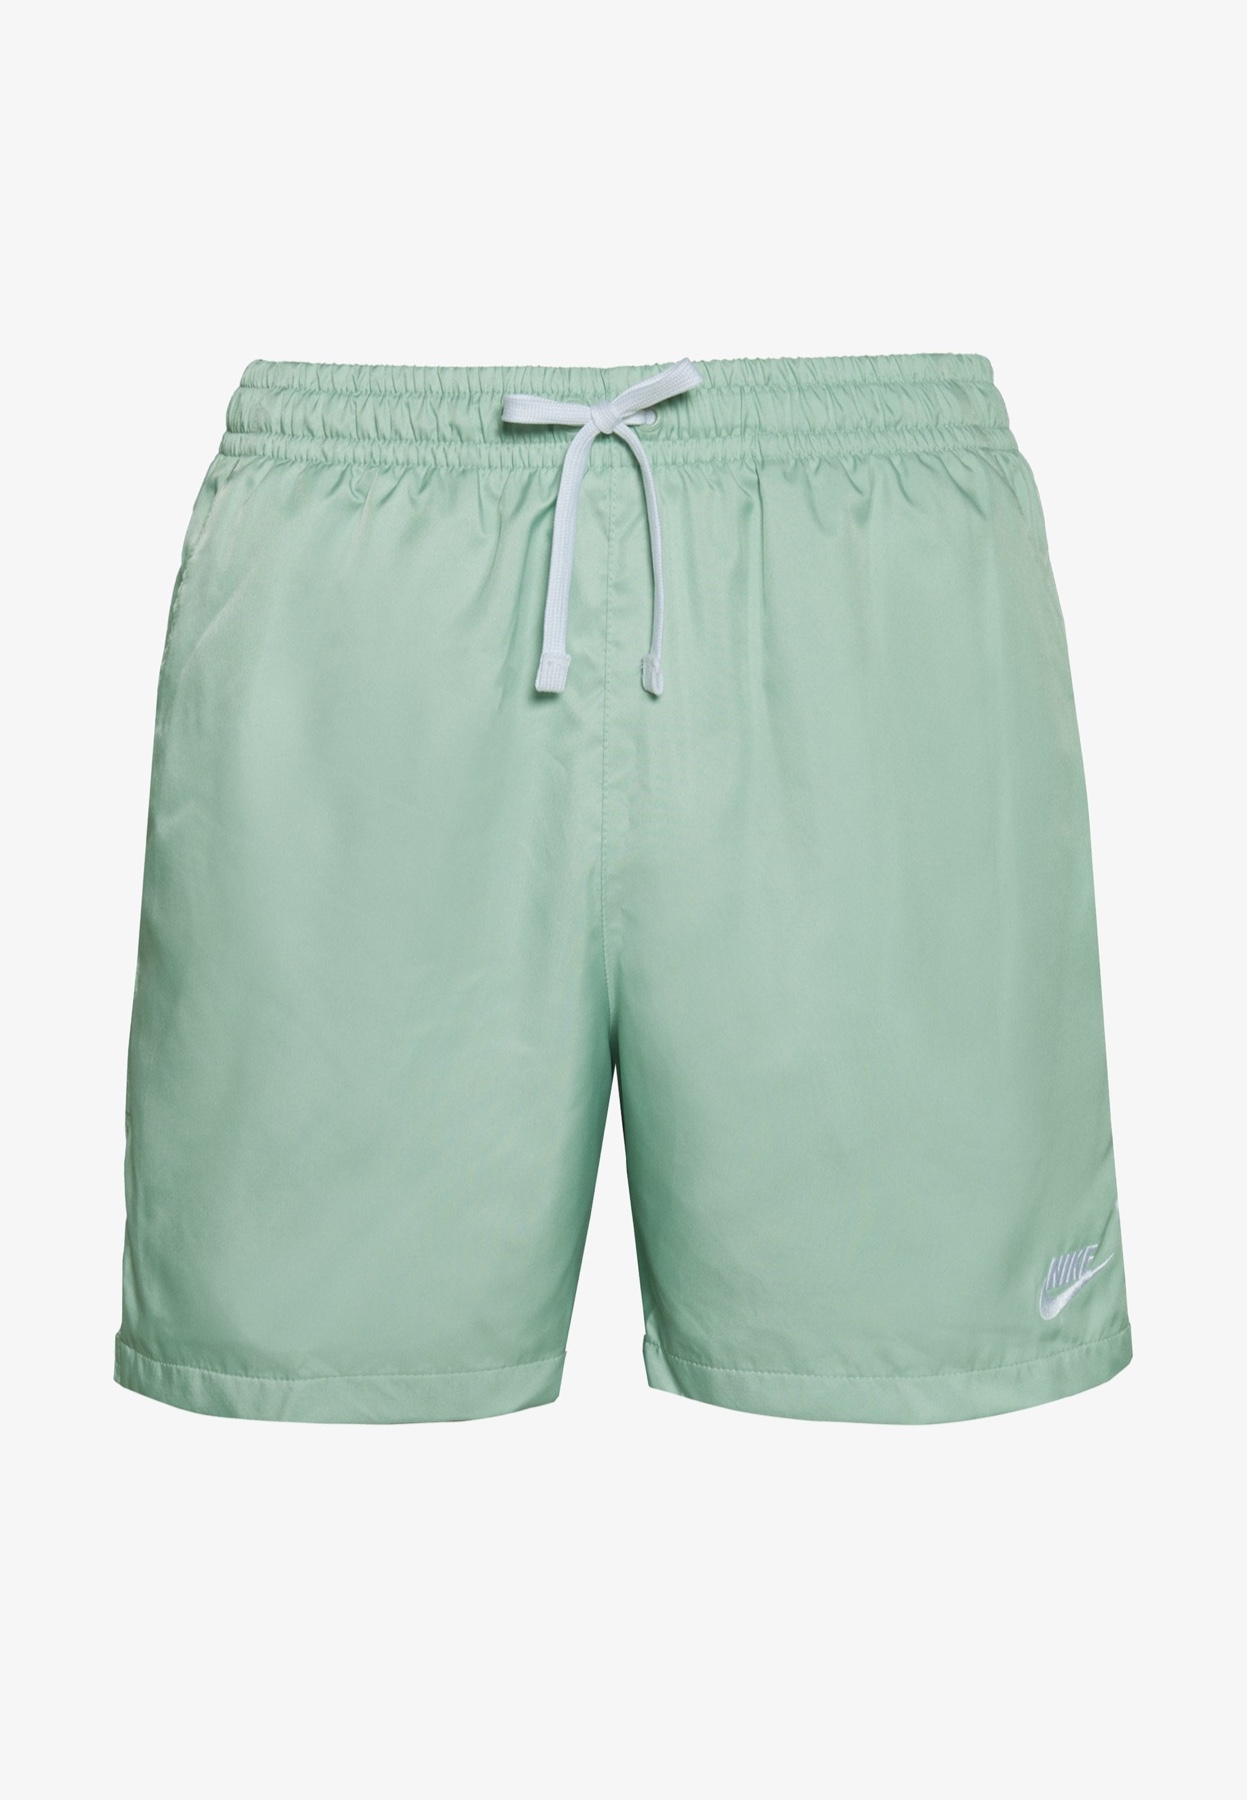 Pantaloncino Nike Sportswear FLOW Shorts